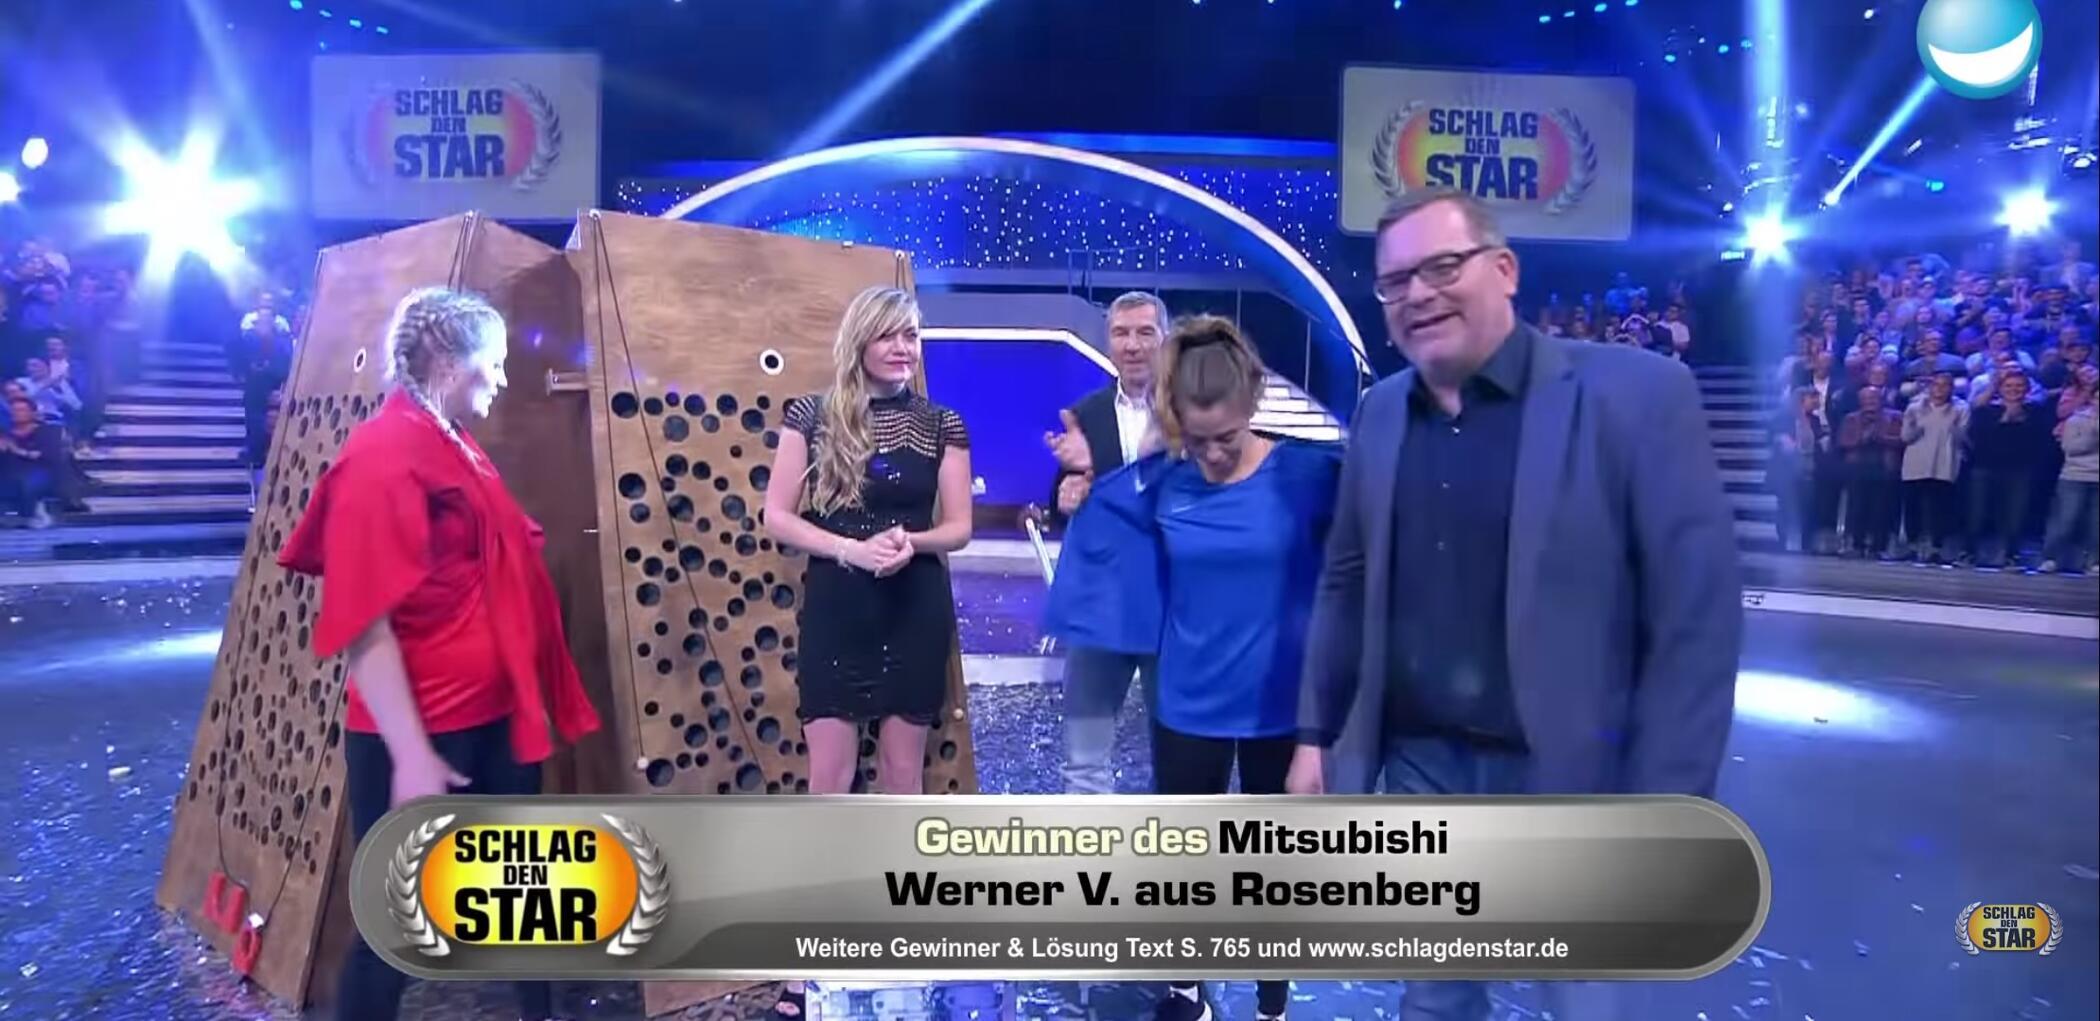 Luna Schweiger Fatcelebs Curvage